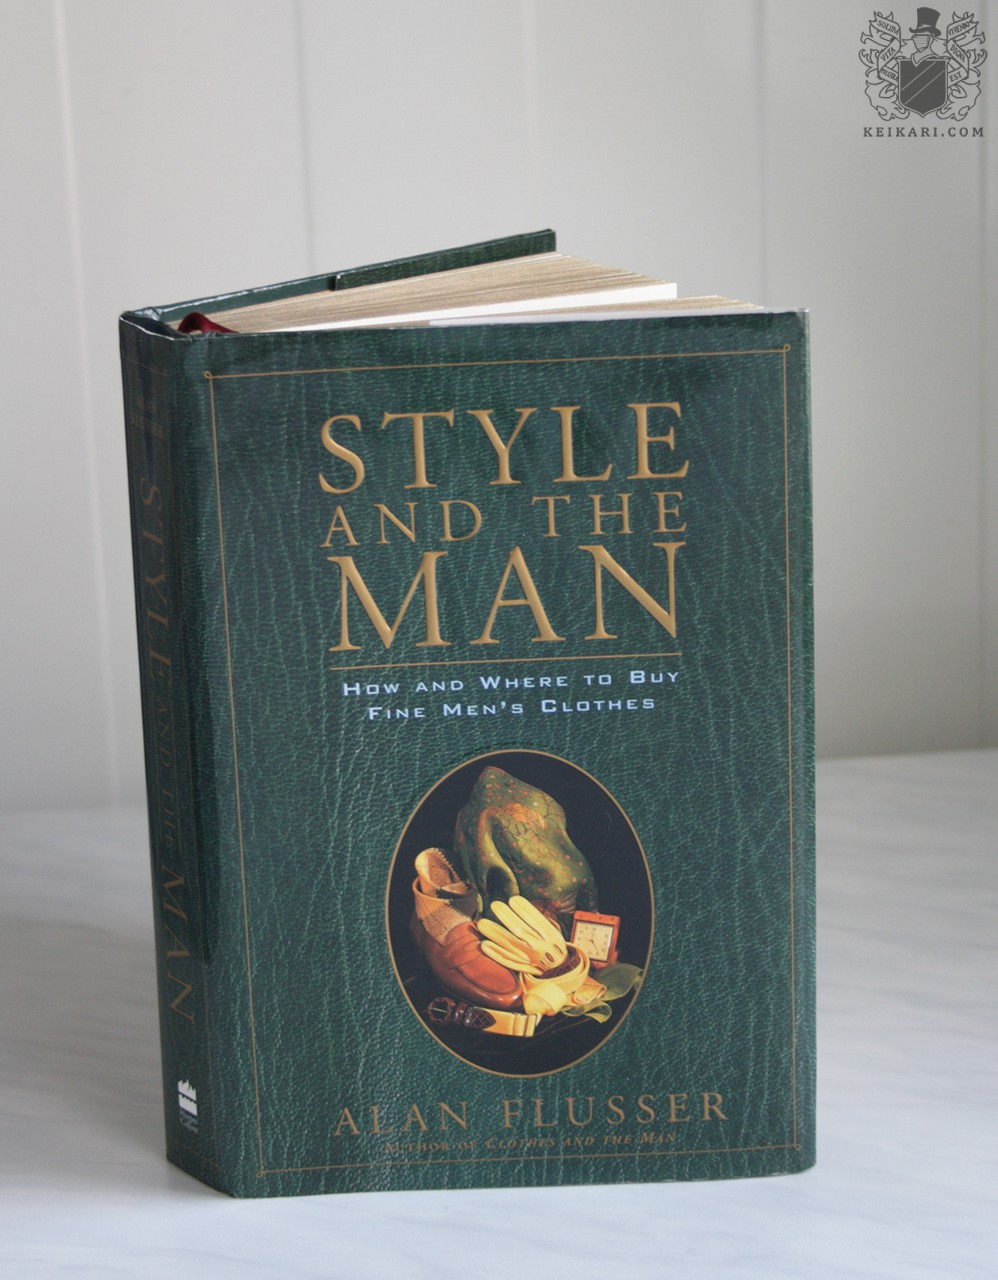 Alan_Flusser_Style_and_the_Man_Keikarissa